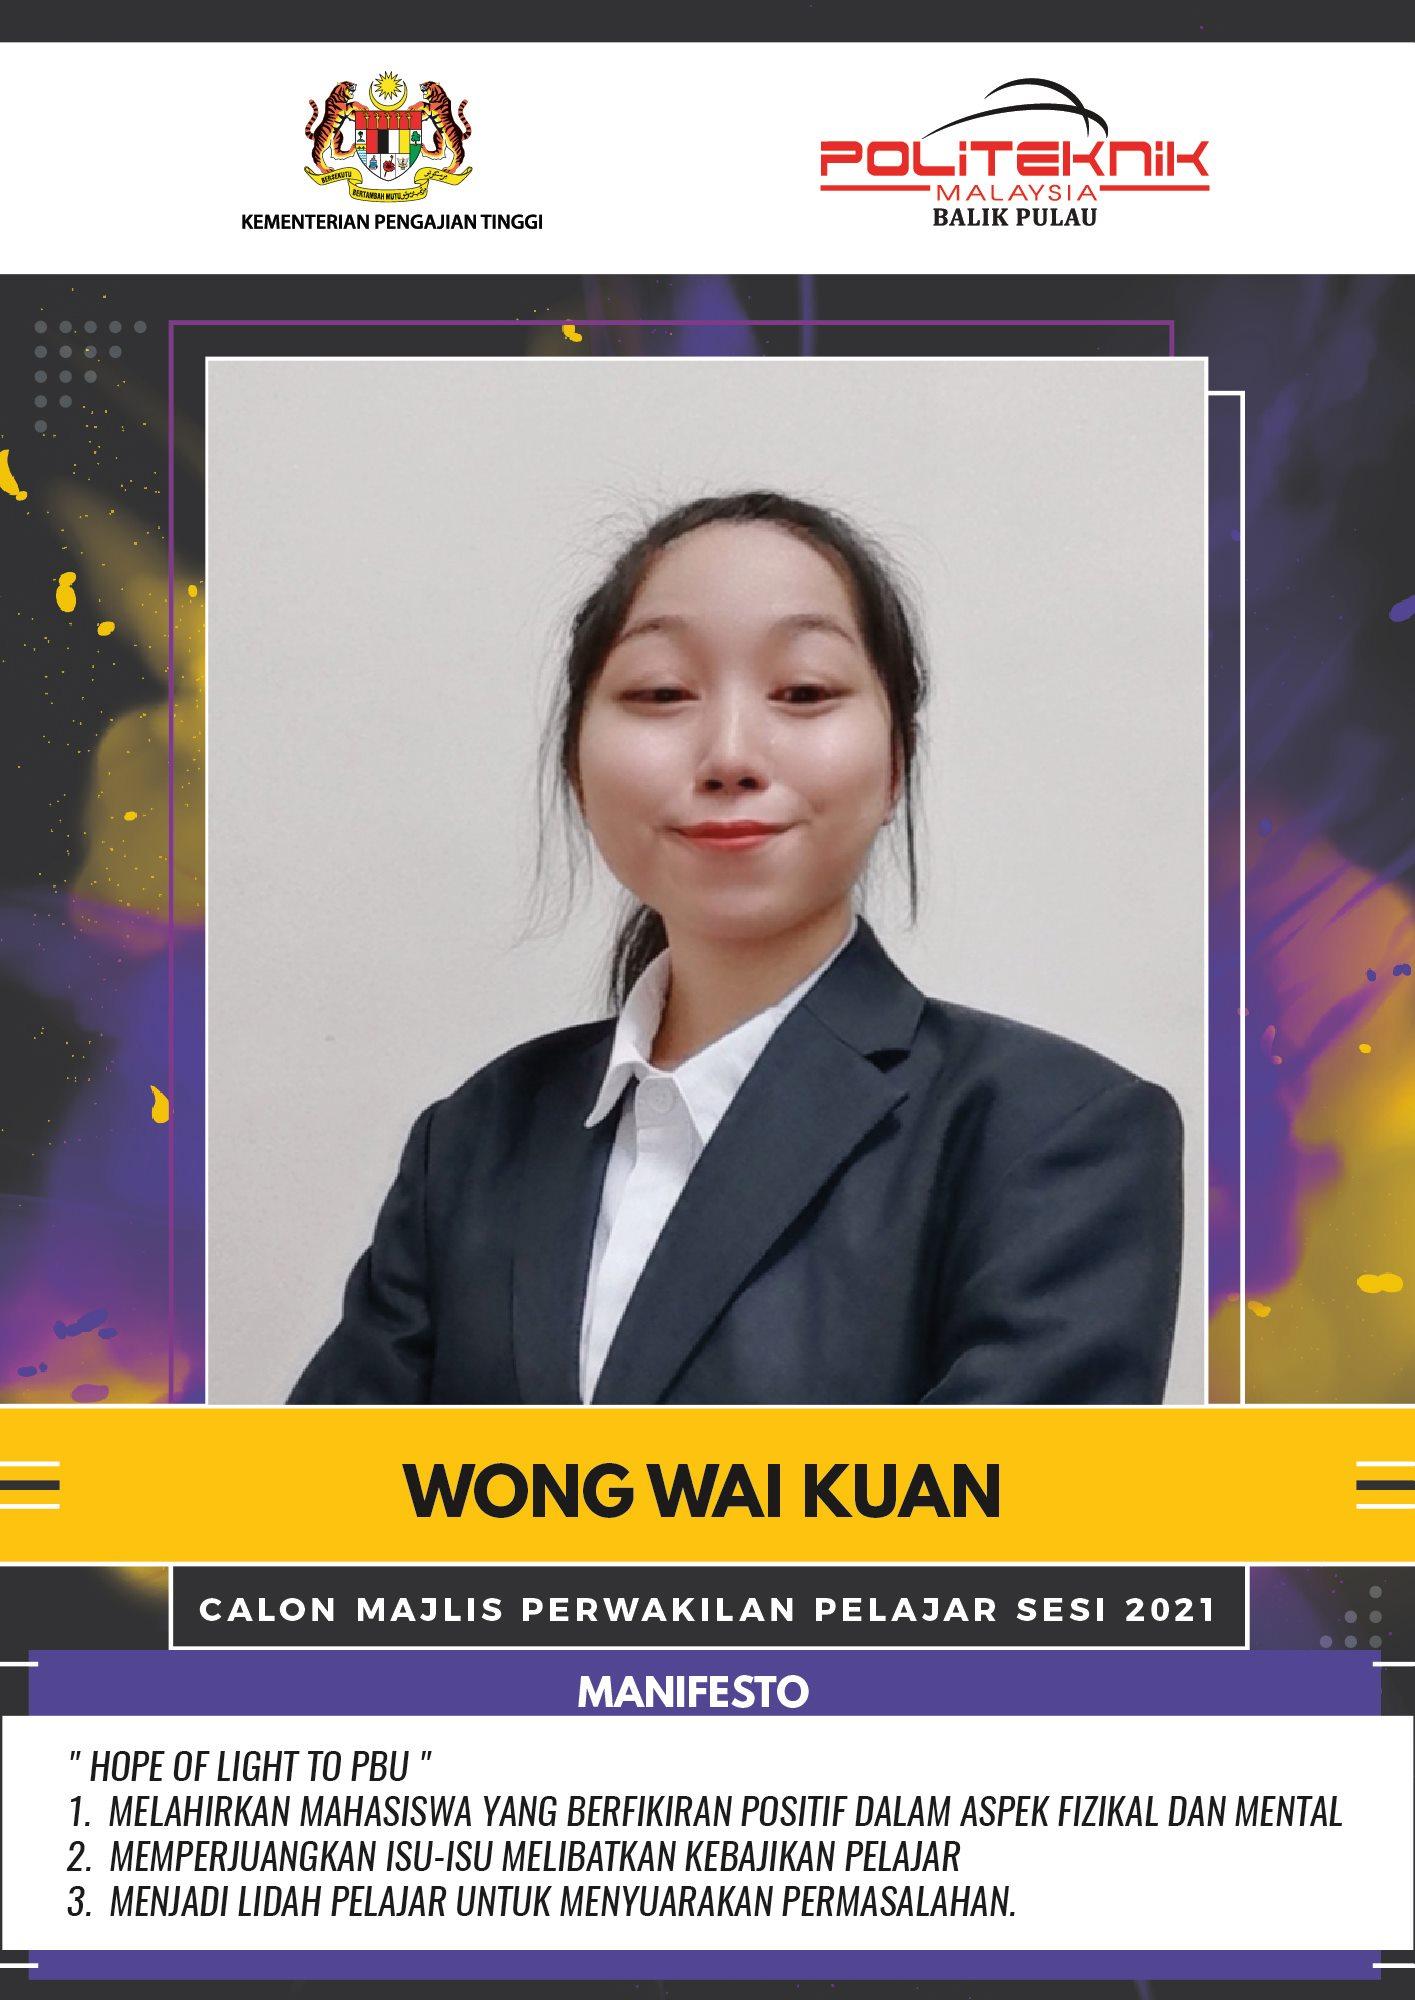 wong wai